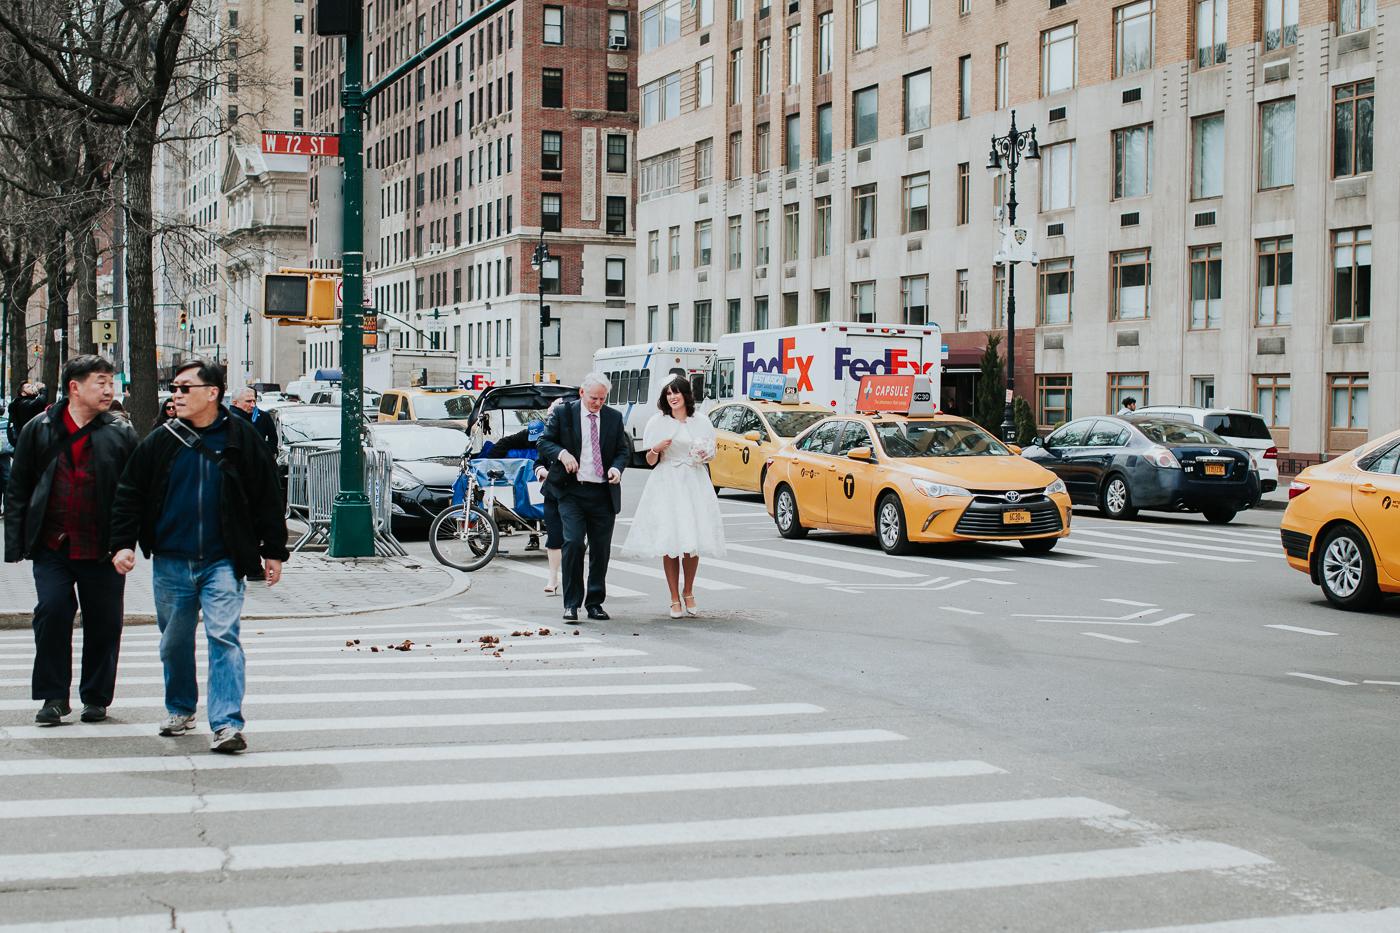 Ladies-Pavilion-Central-Park-NYC-Documentary-Elopement-Wedding-Photographer-8.jpg